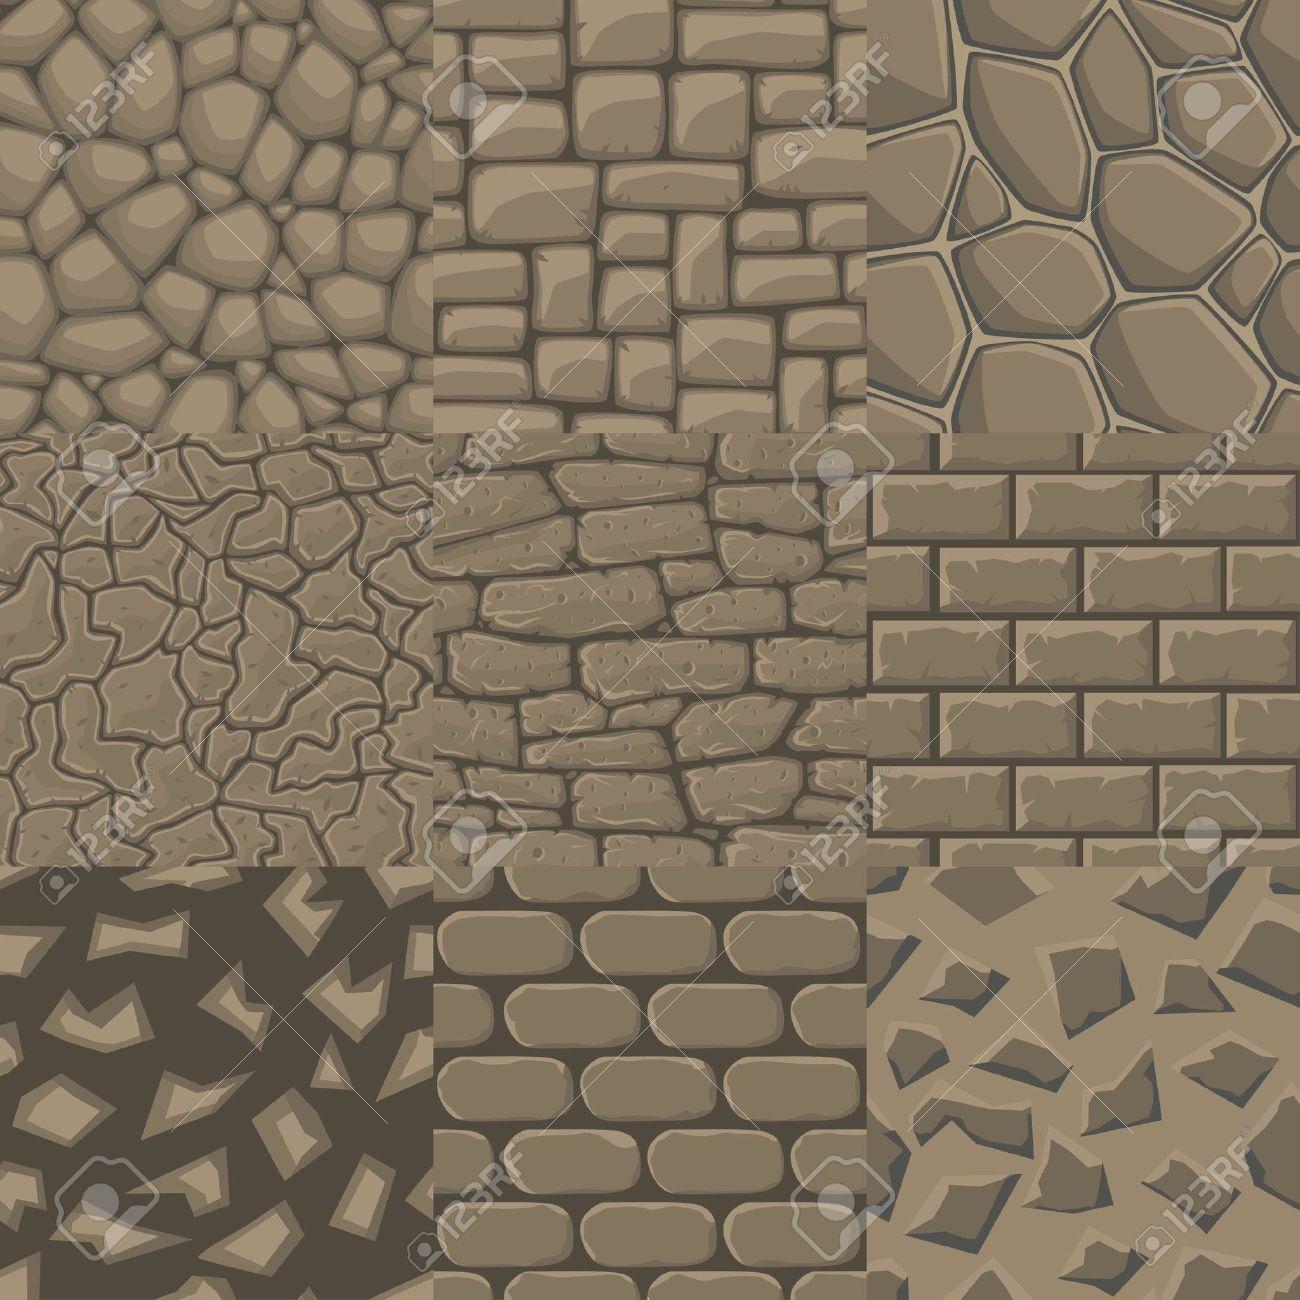 1300x1300 Cobblestone Clipart Wall Texture